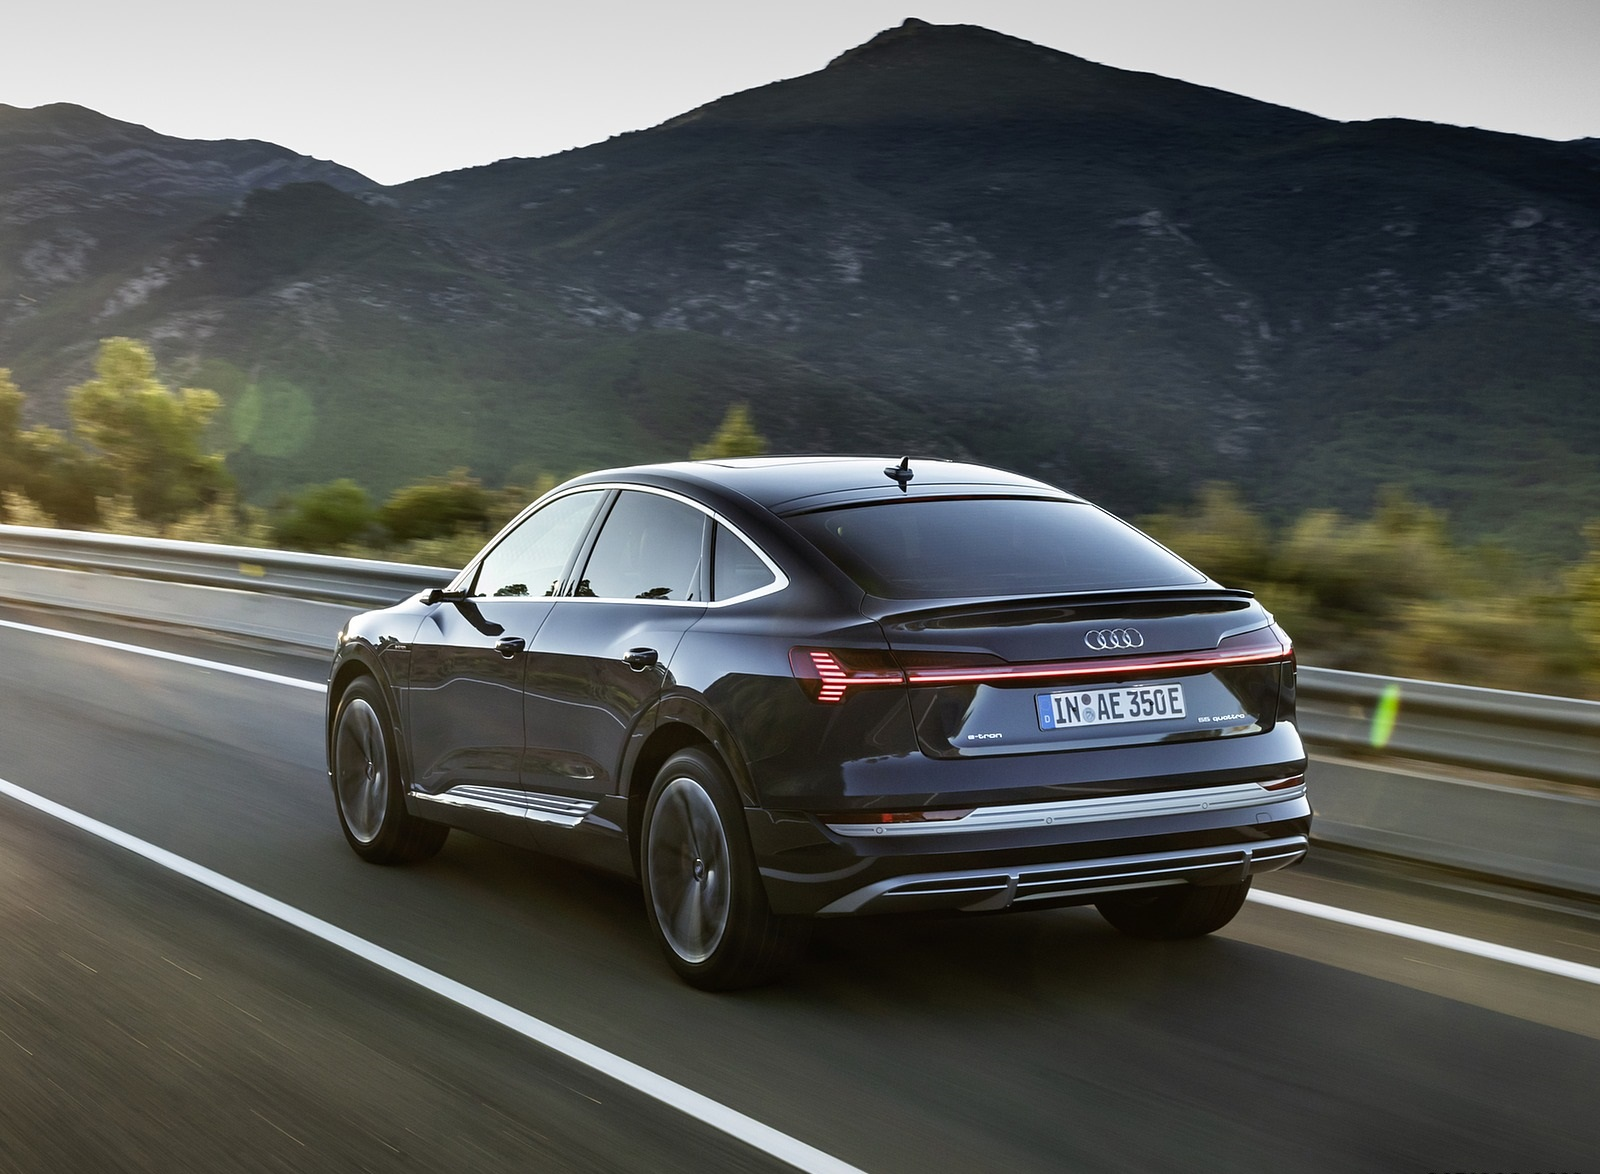 2020 Audi e-tron Sportback (Color: Plasma Blue) Rear Three-Quarter Wallpapers (8)